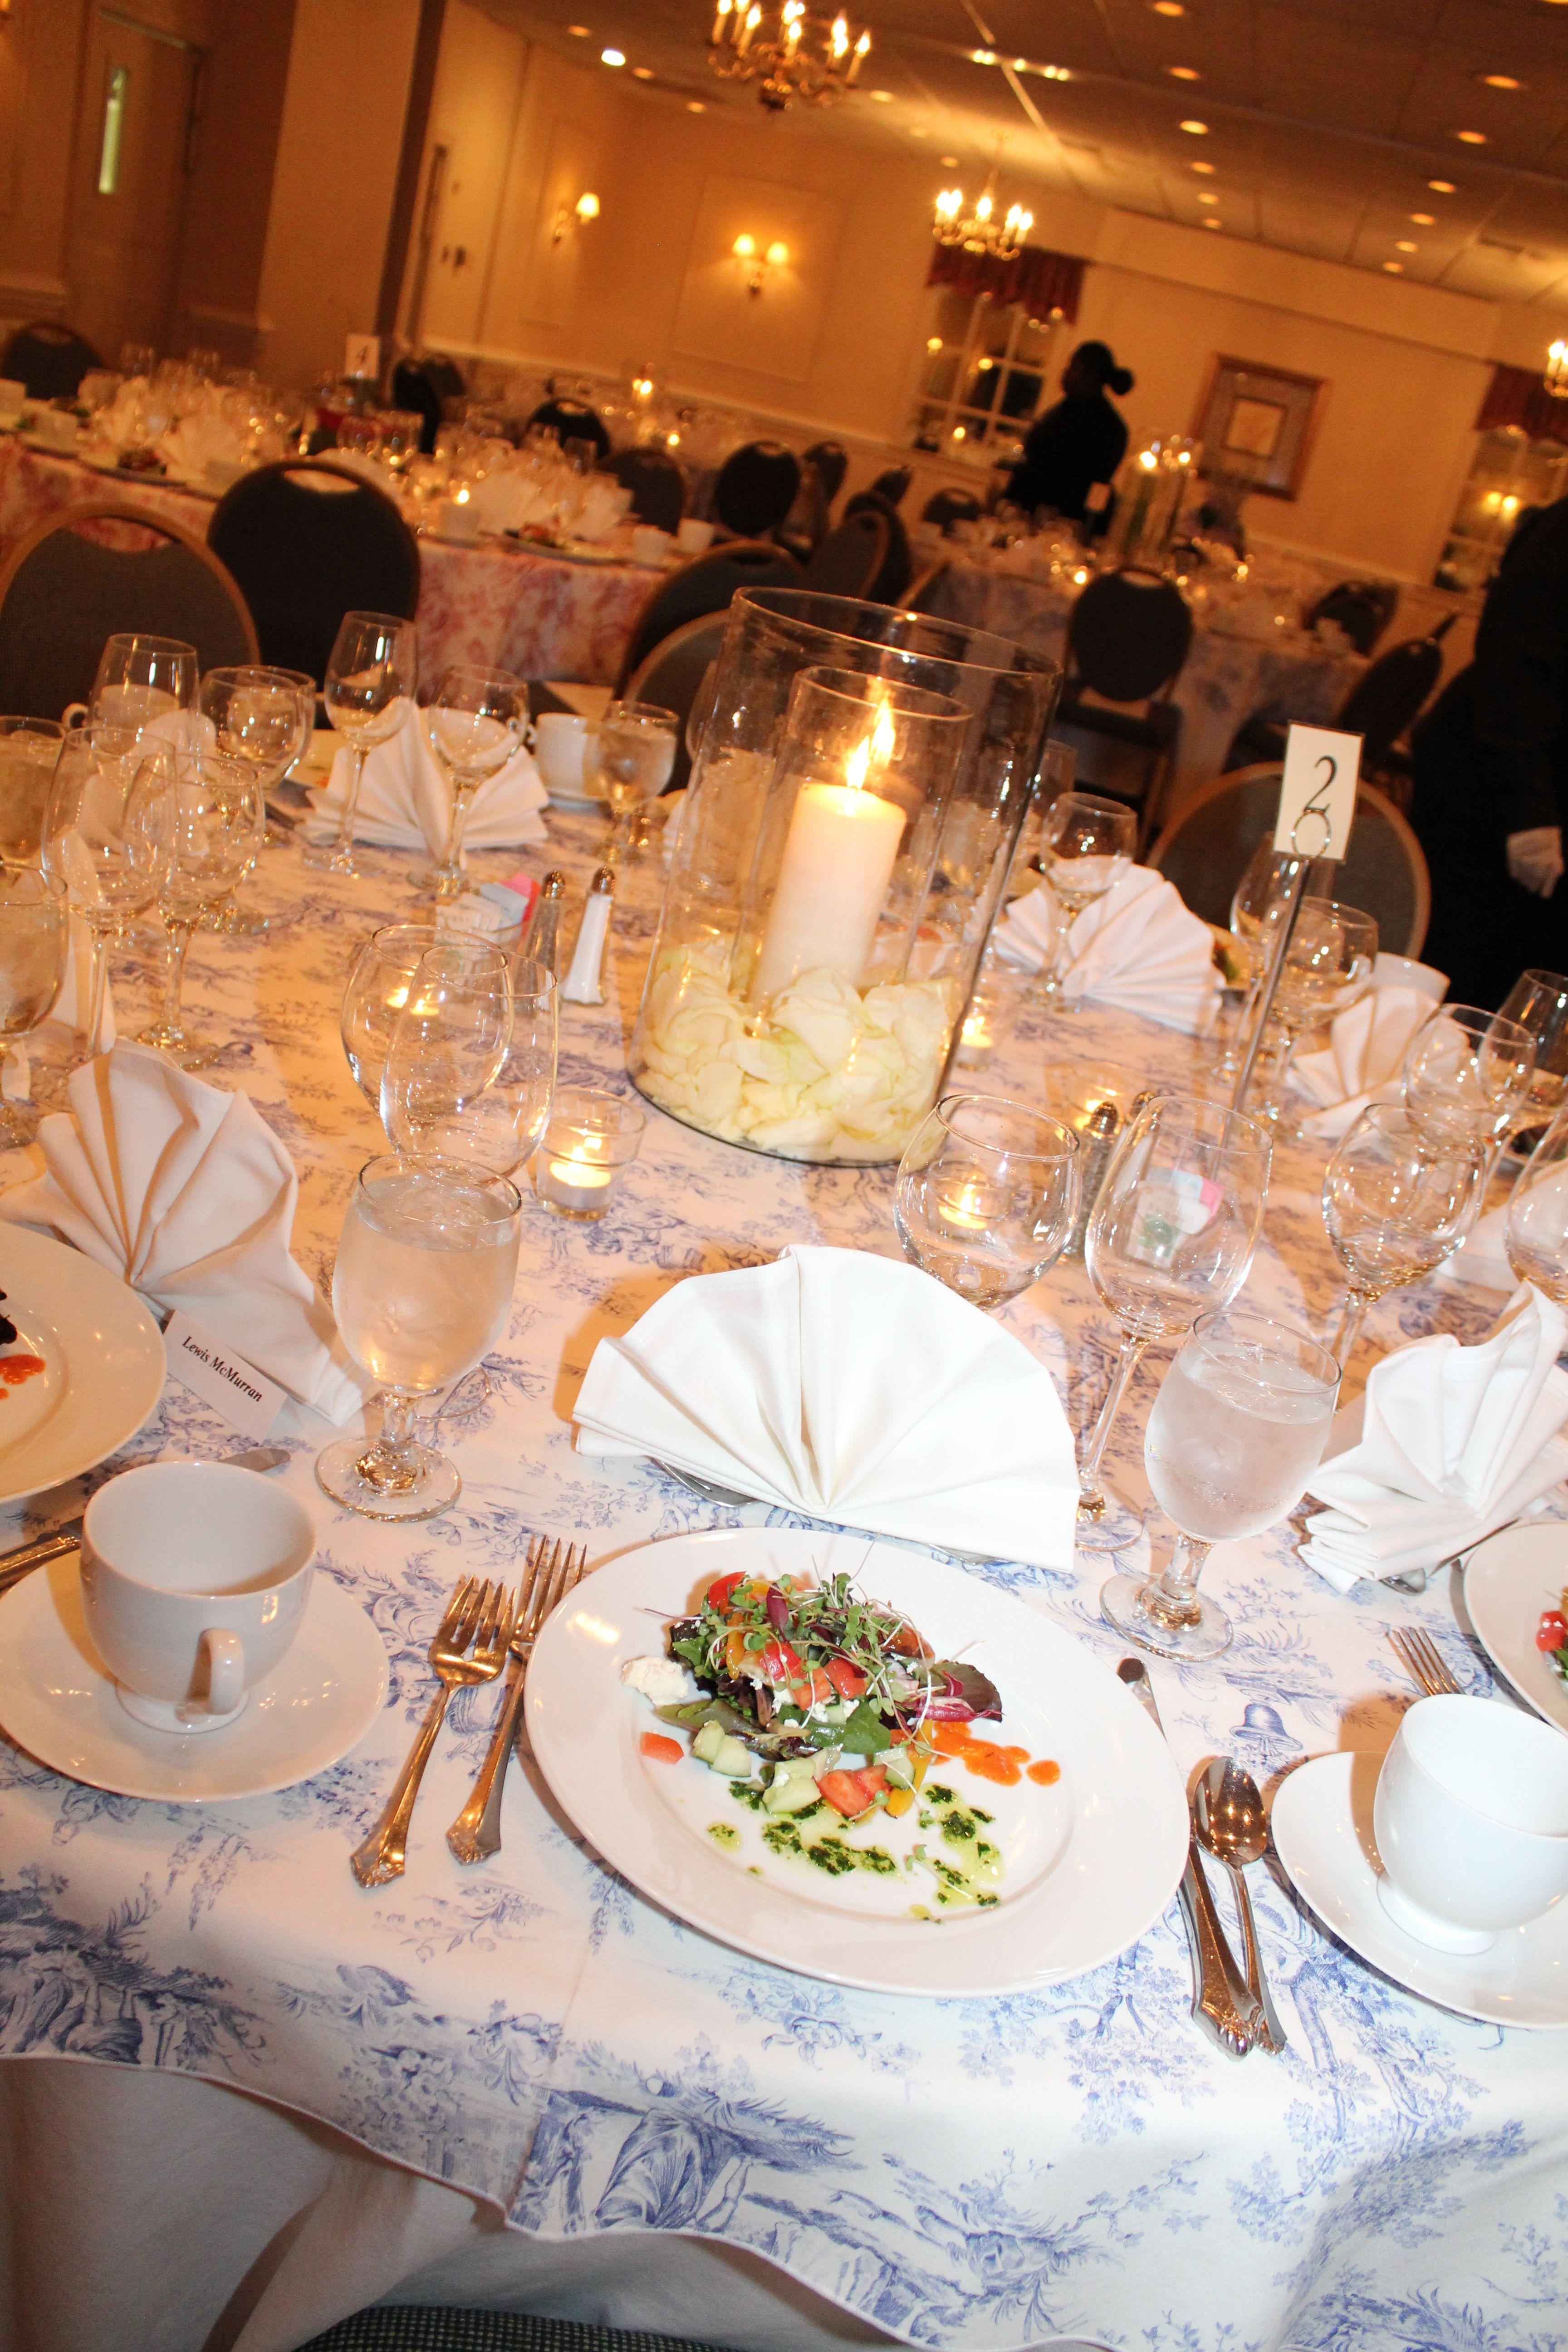 Point Plaza Suites Hotel The Catering Company - Williamsburg Va www.williamsburgoccasions.com